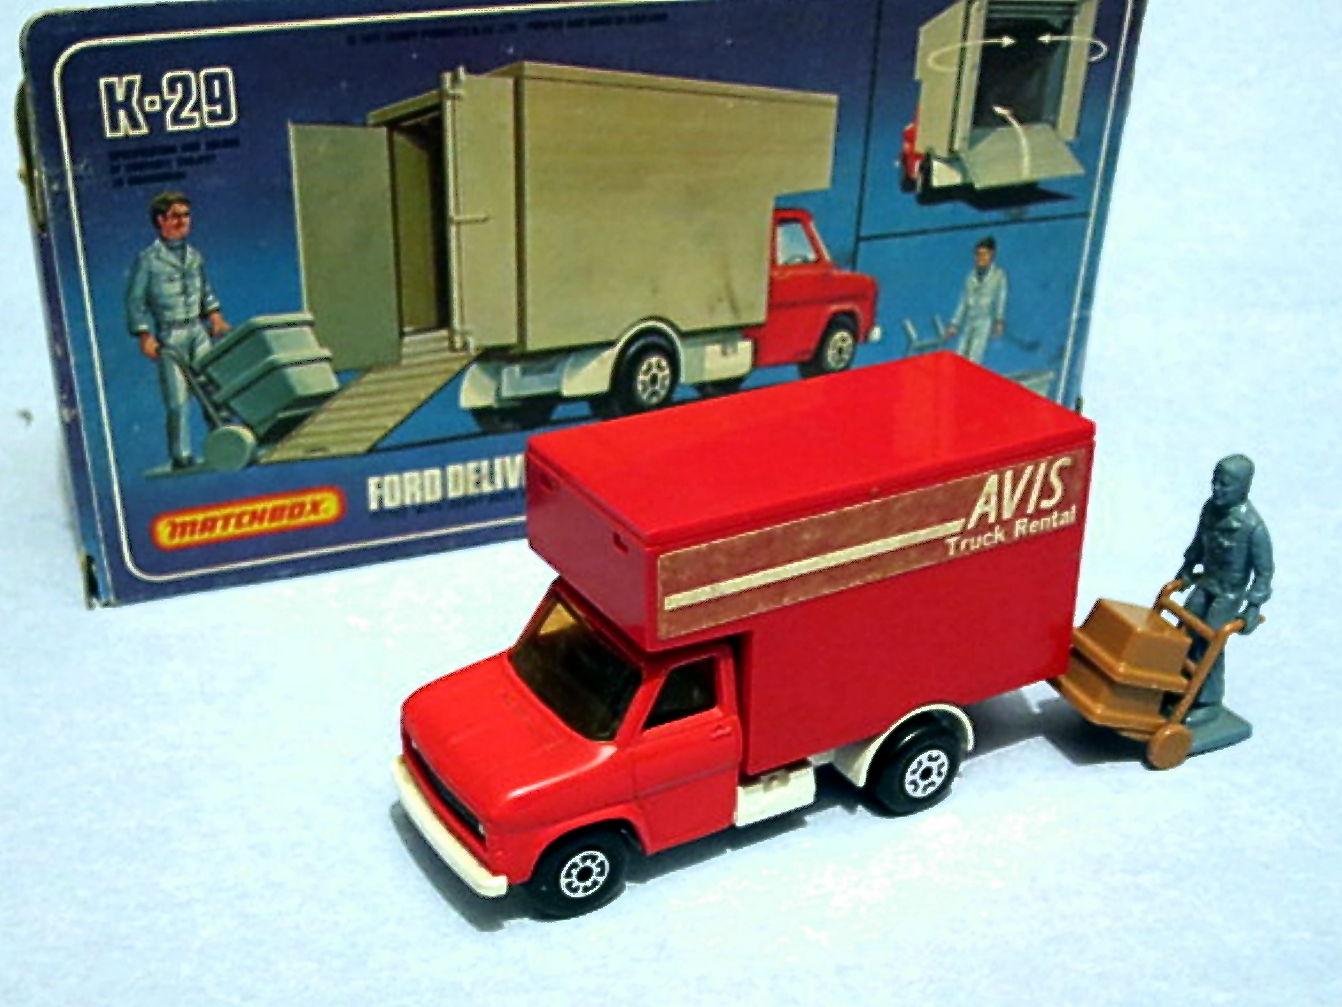 Ford Delivery Van (K-29)